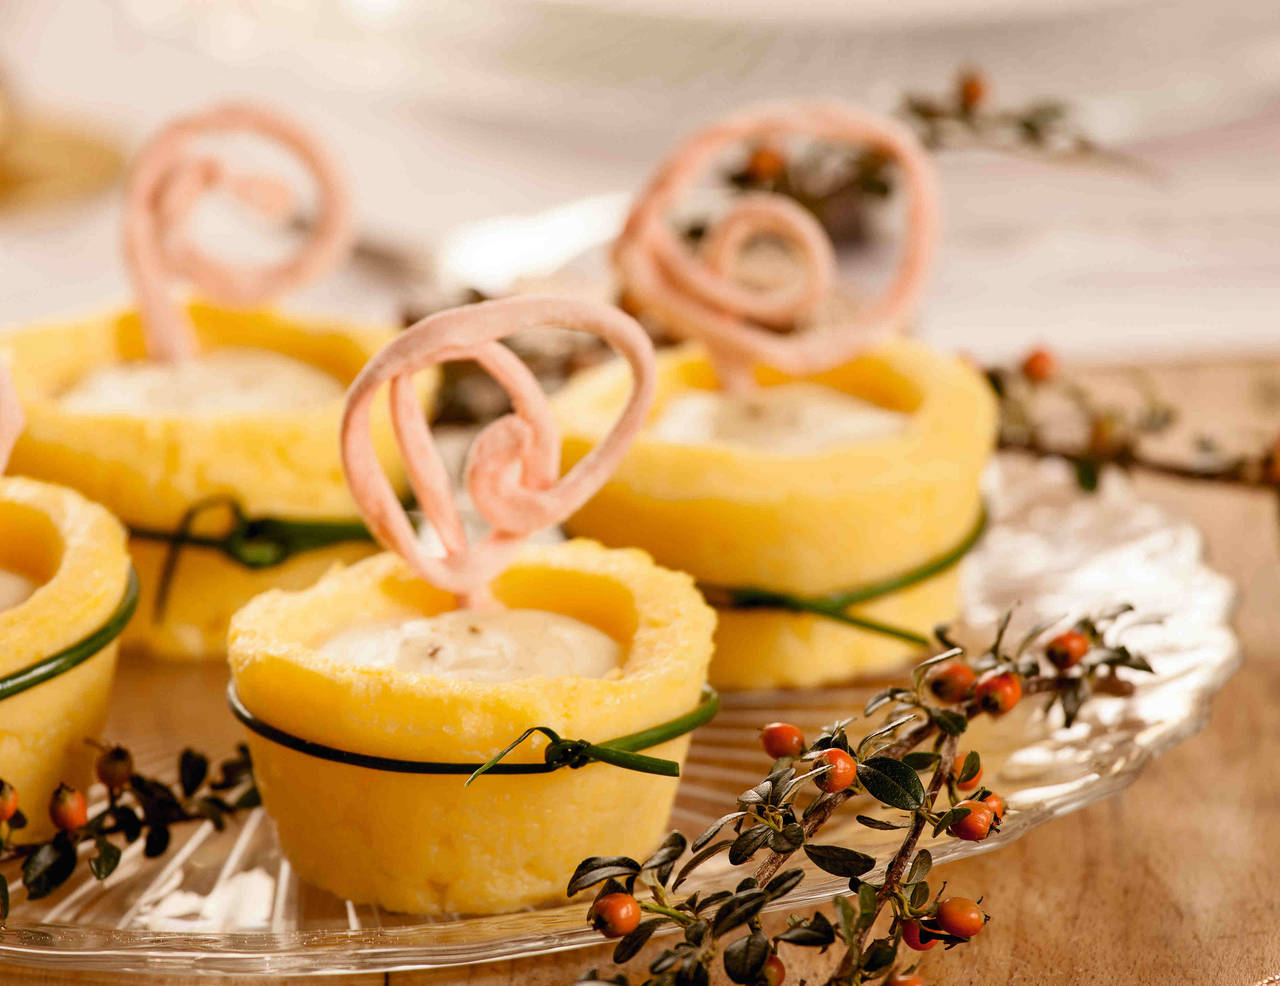 Cestini Di Polenta Con Fonduta Di Fontina Cucina Naturale #C54505 1280 986 Programma Per Creare Ricette Di Cucina